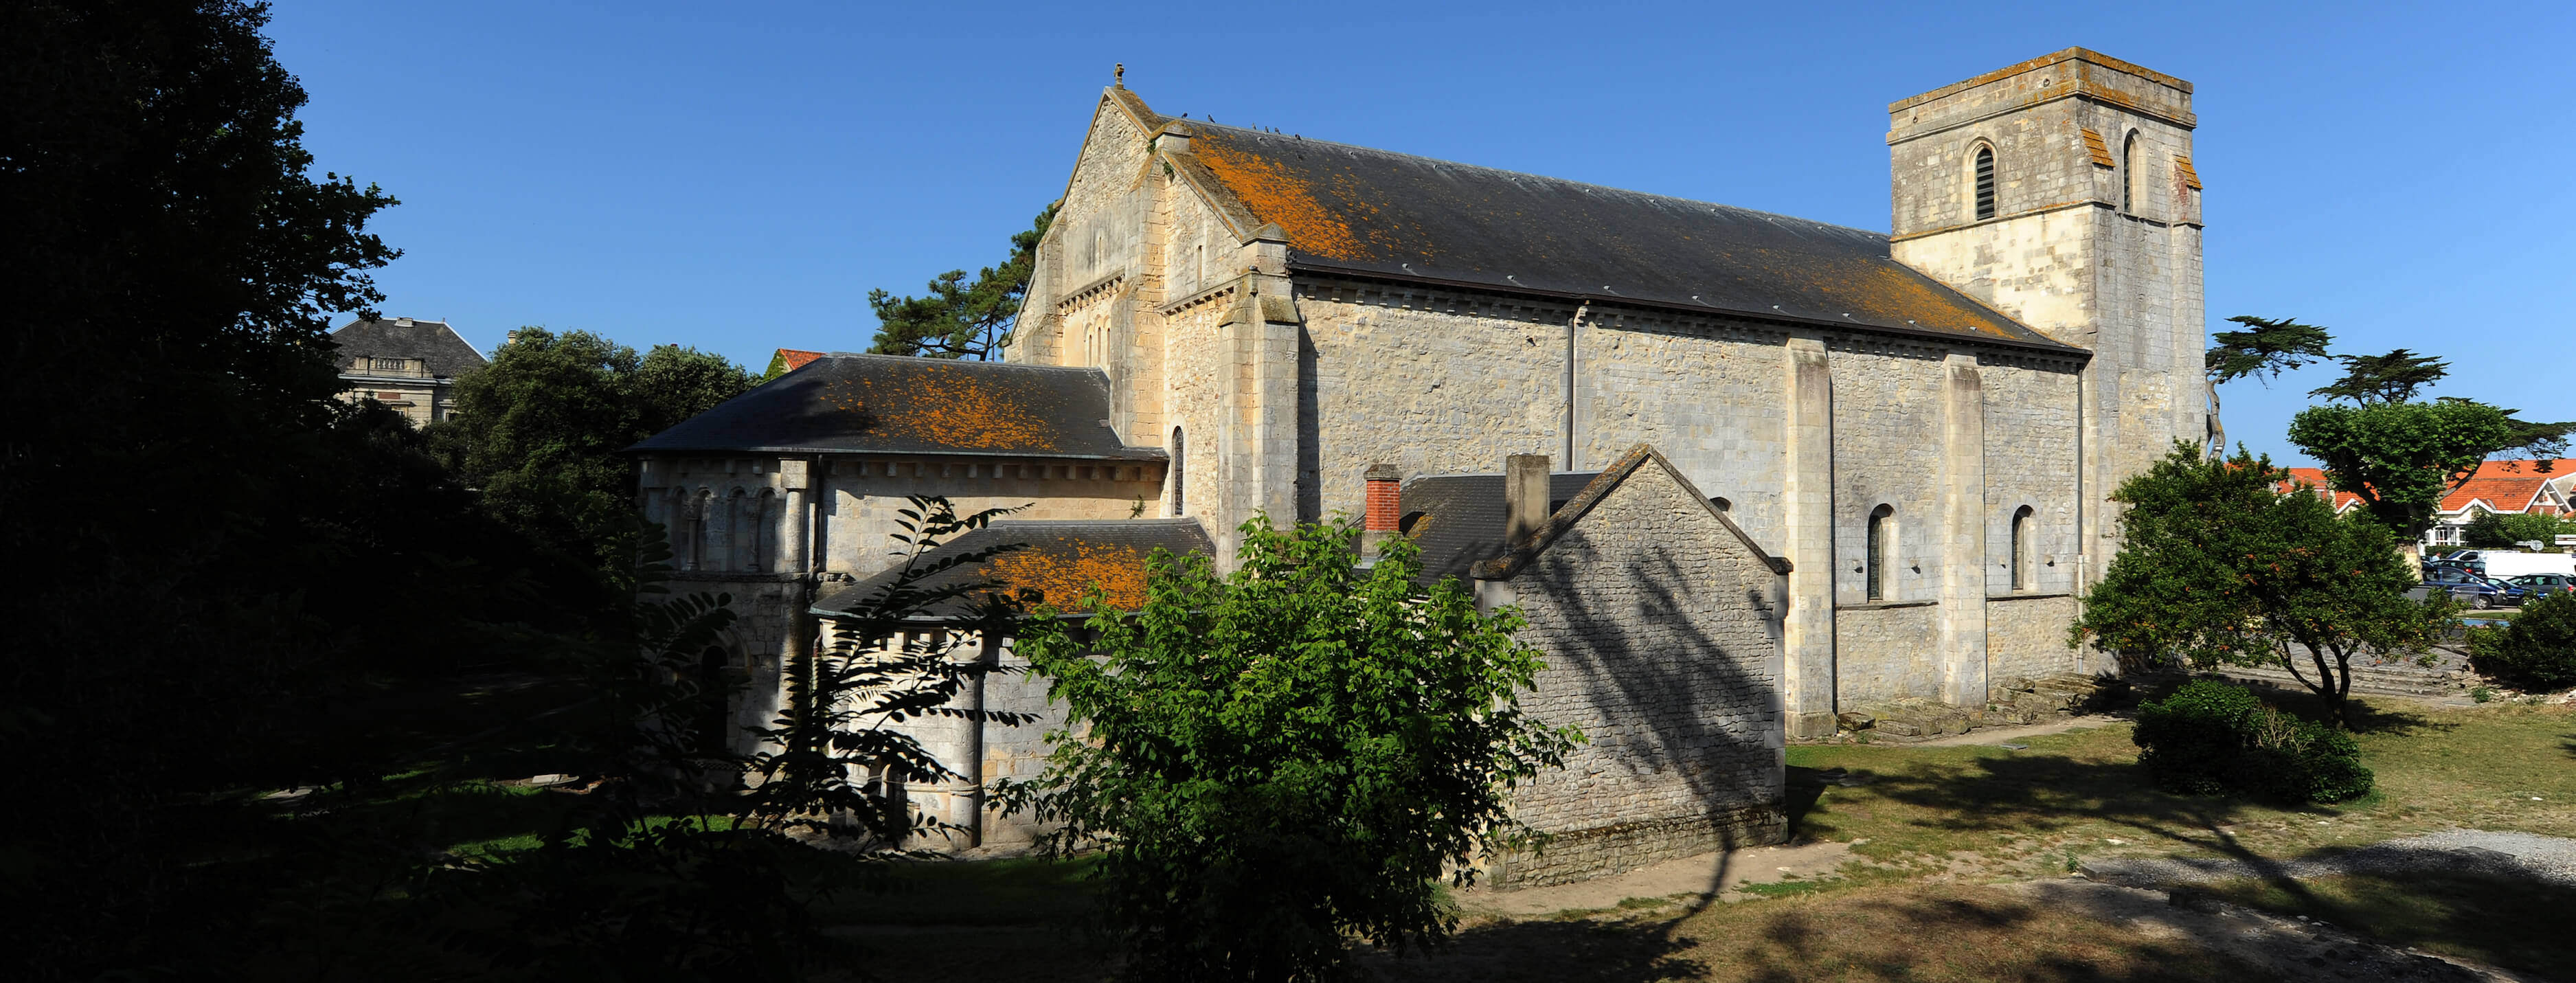 Eglise Notre-Dame-de-la-Fin-Terres©ACIR / JJ Gelbart